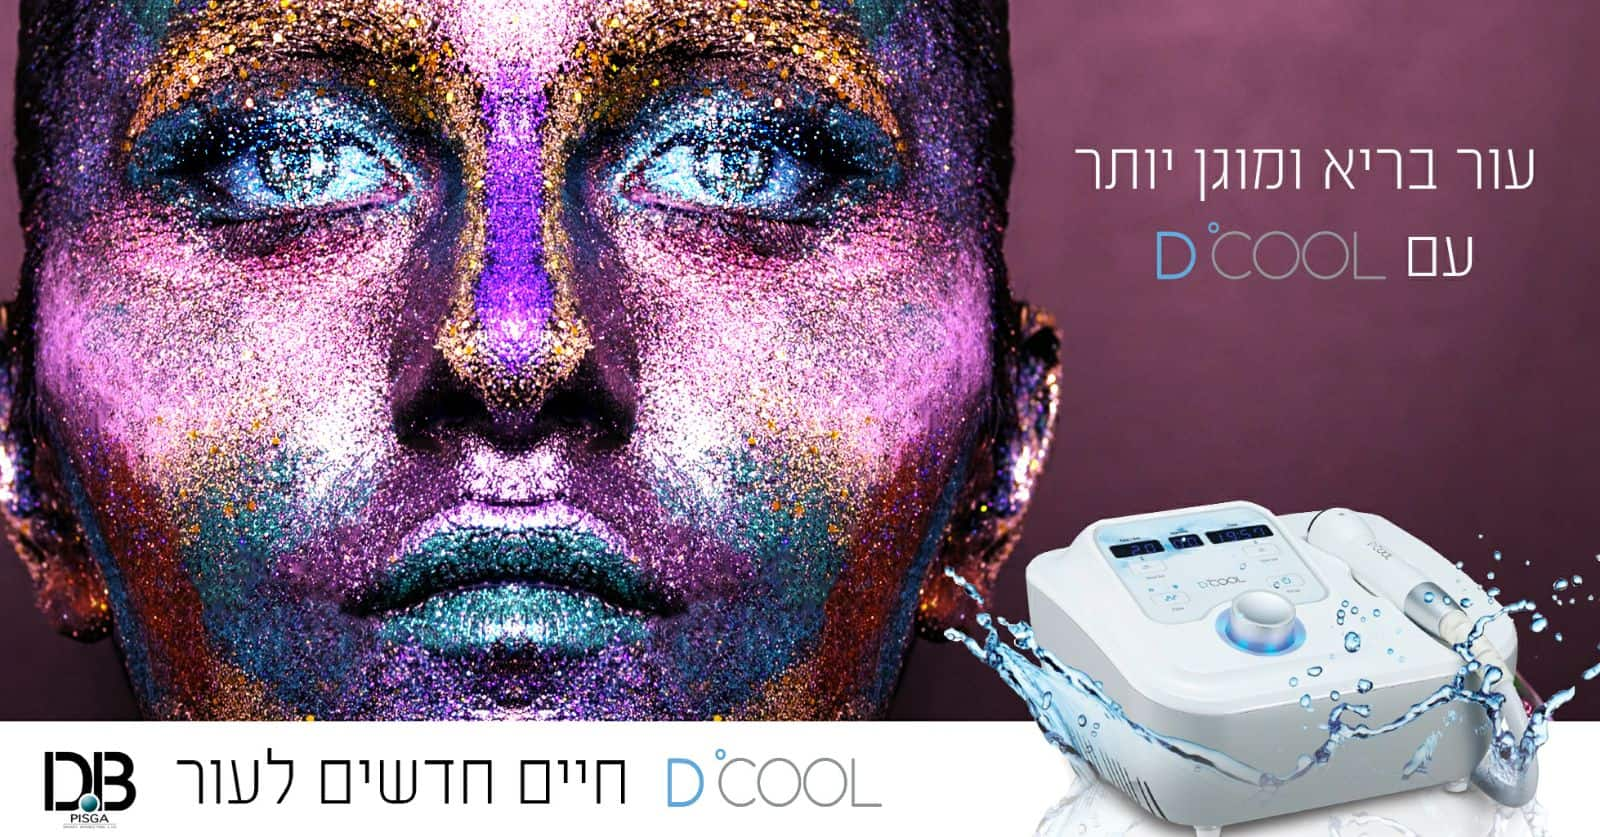 D'COOL טיפולי פנים חדשניים